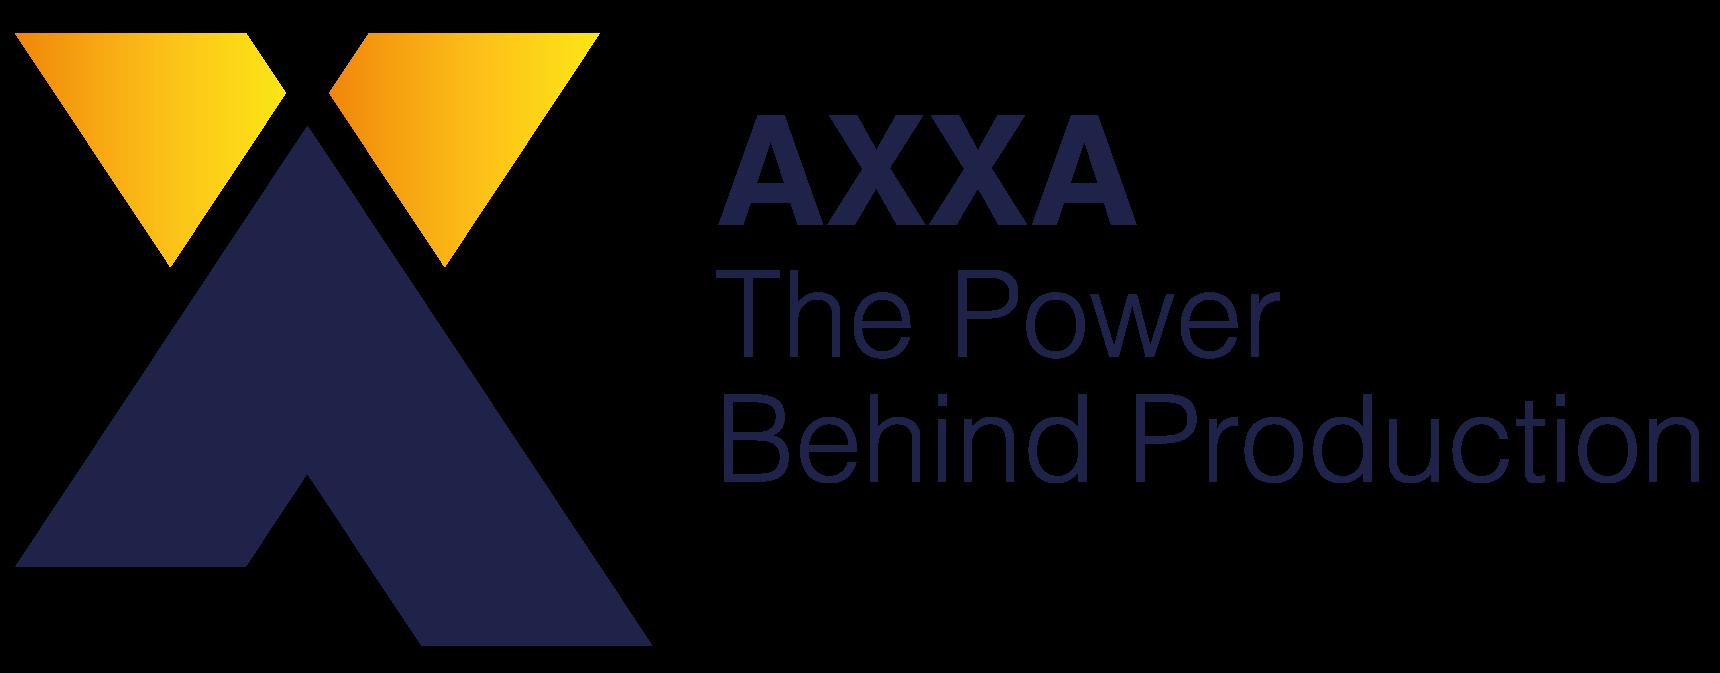 Axxa Ltd The Power behind production  logo of the organisation